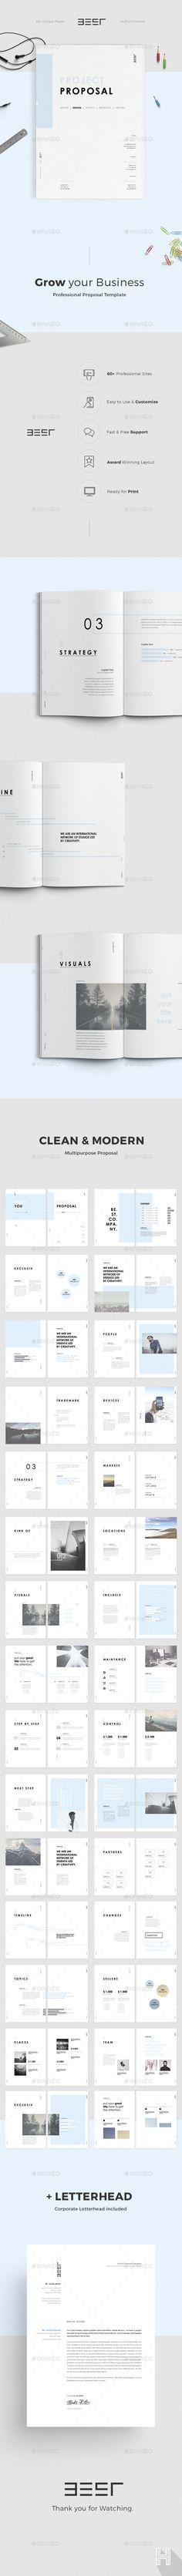 Proposal — Photoshop PSD #brochure #estimate • Download ➝ https://graphicriver.net/item/proposal/19531886?ref=pxcr